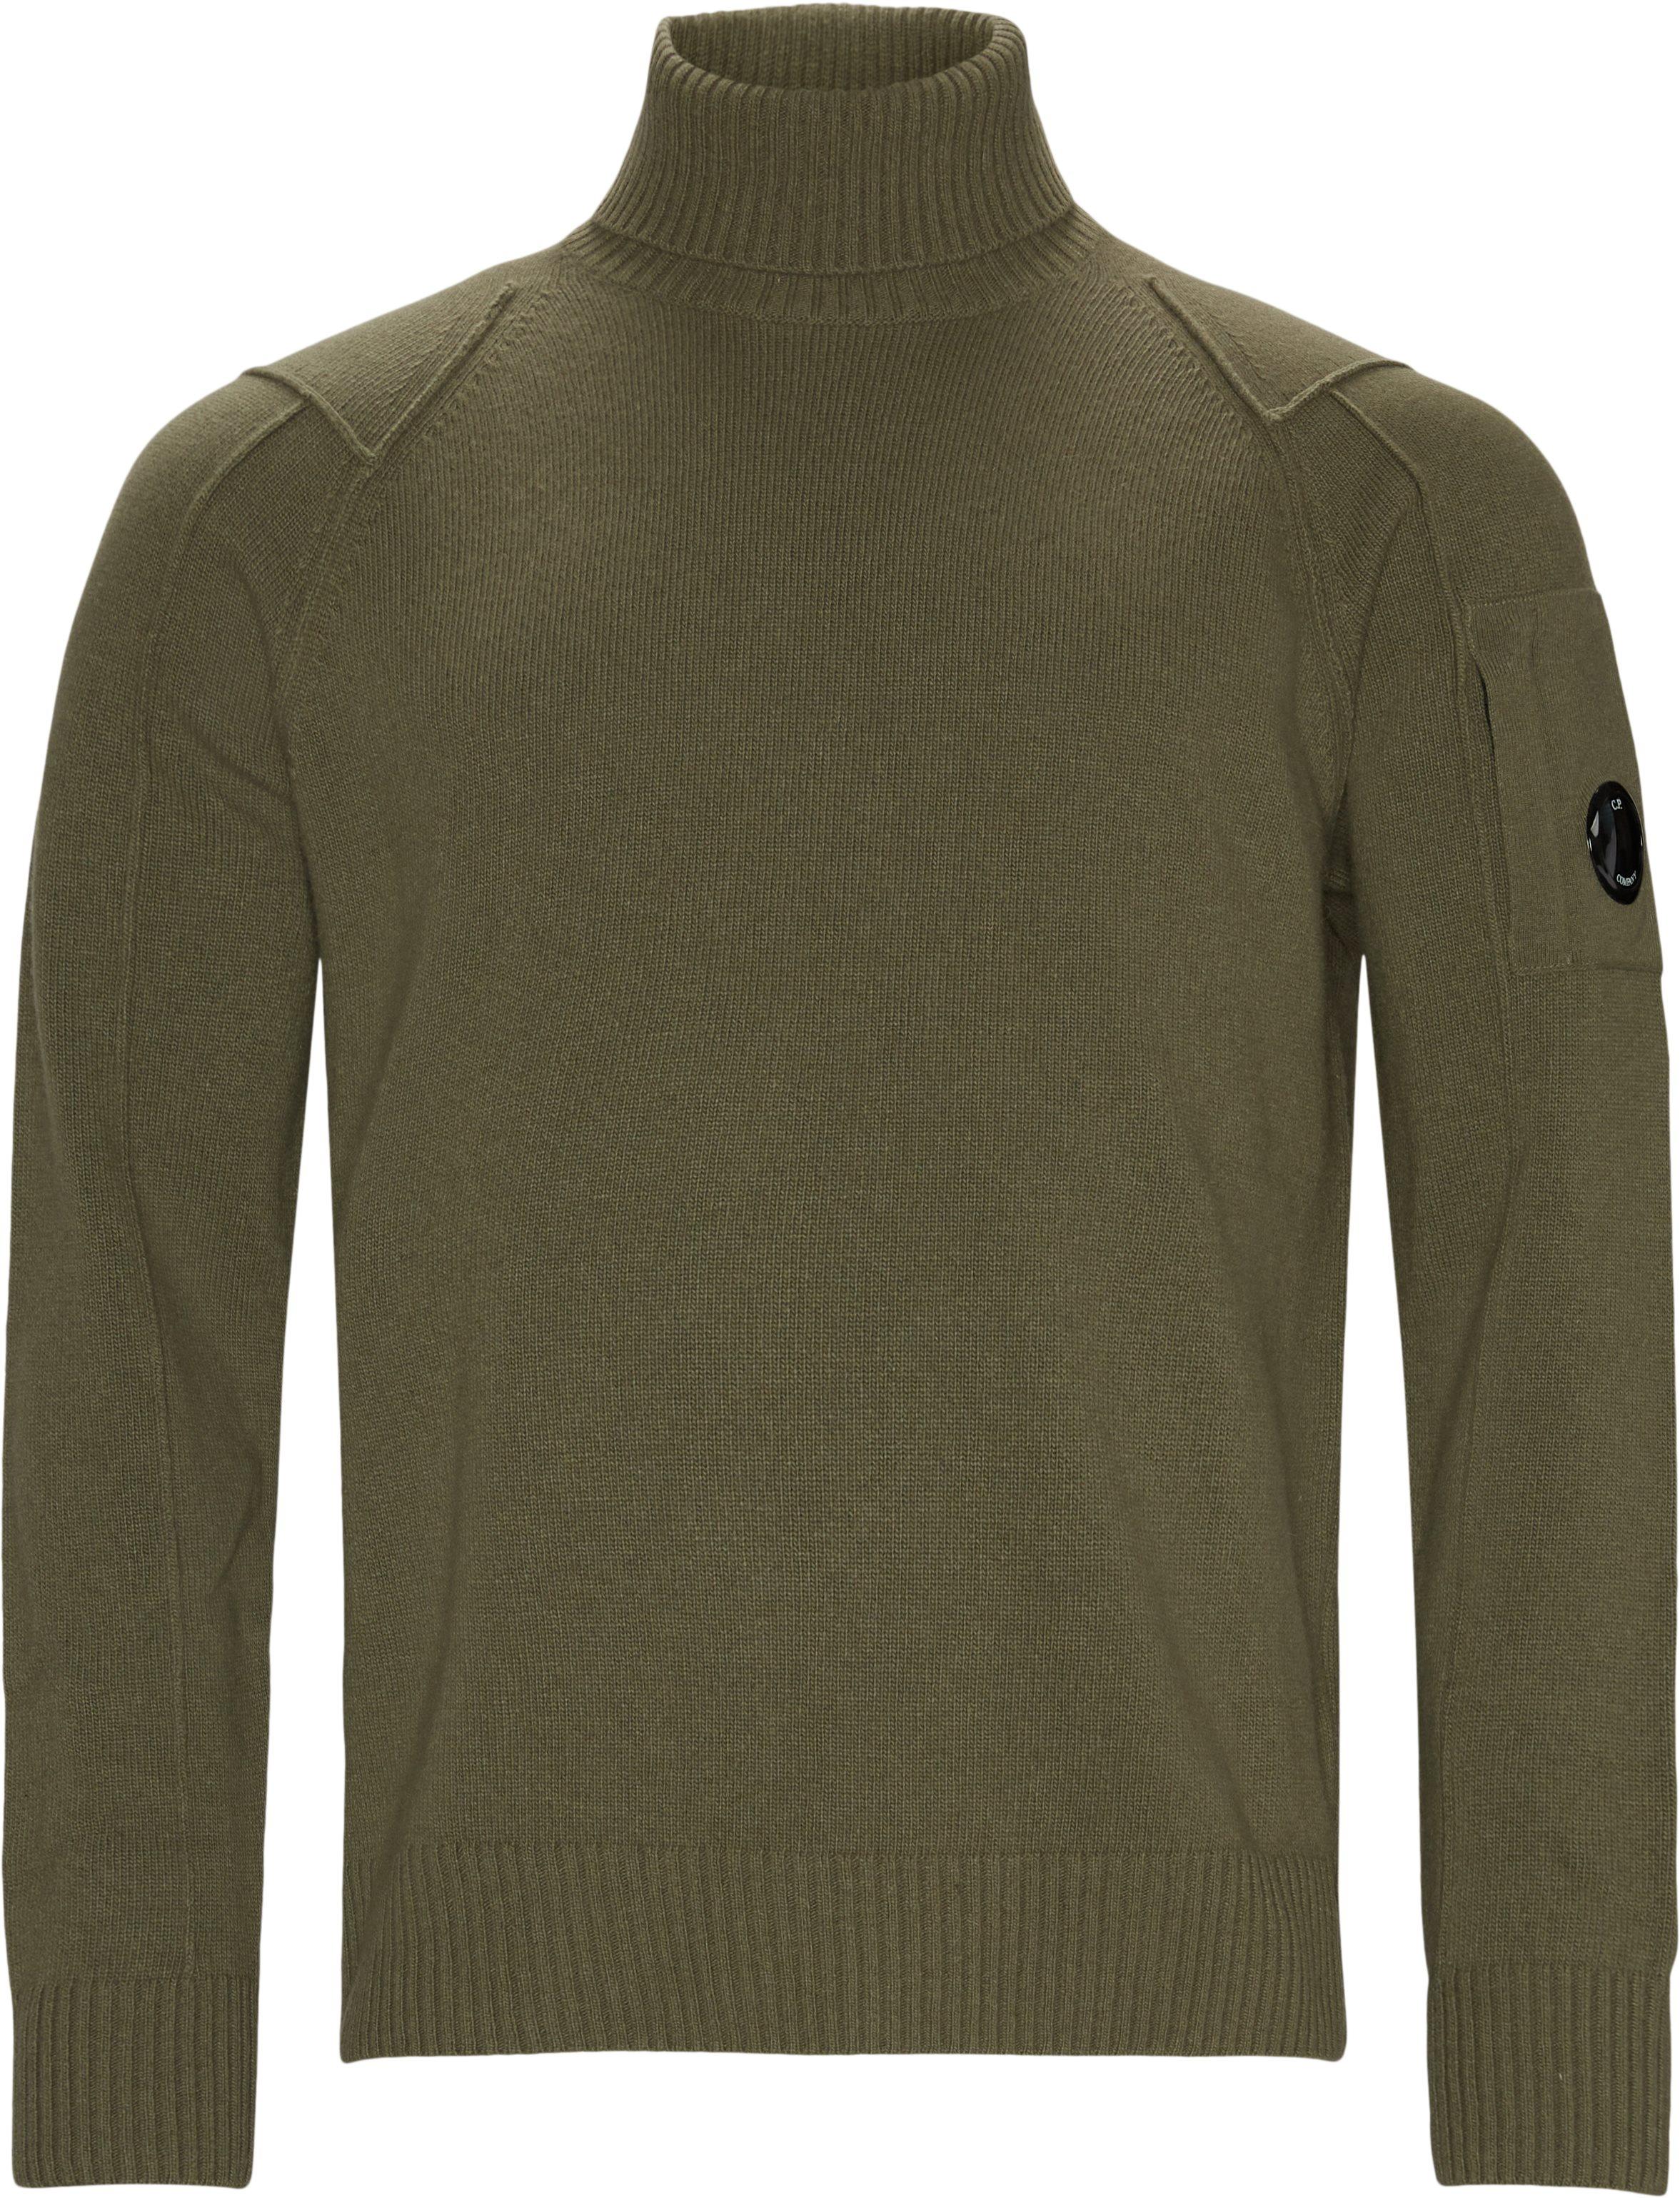 Rollneck Knit - Strik - Regular fit - Army